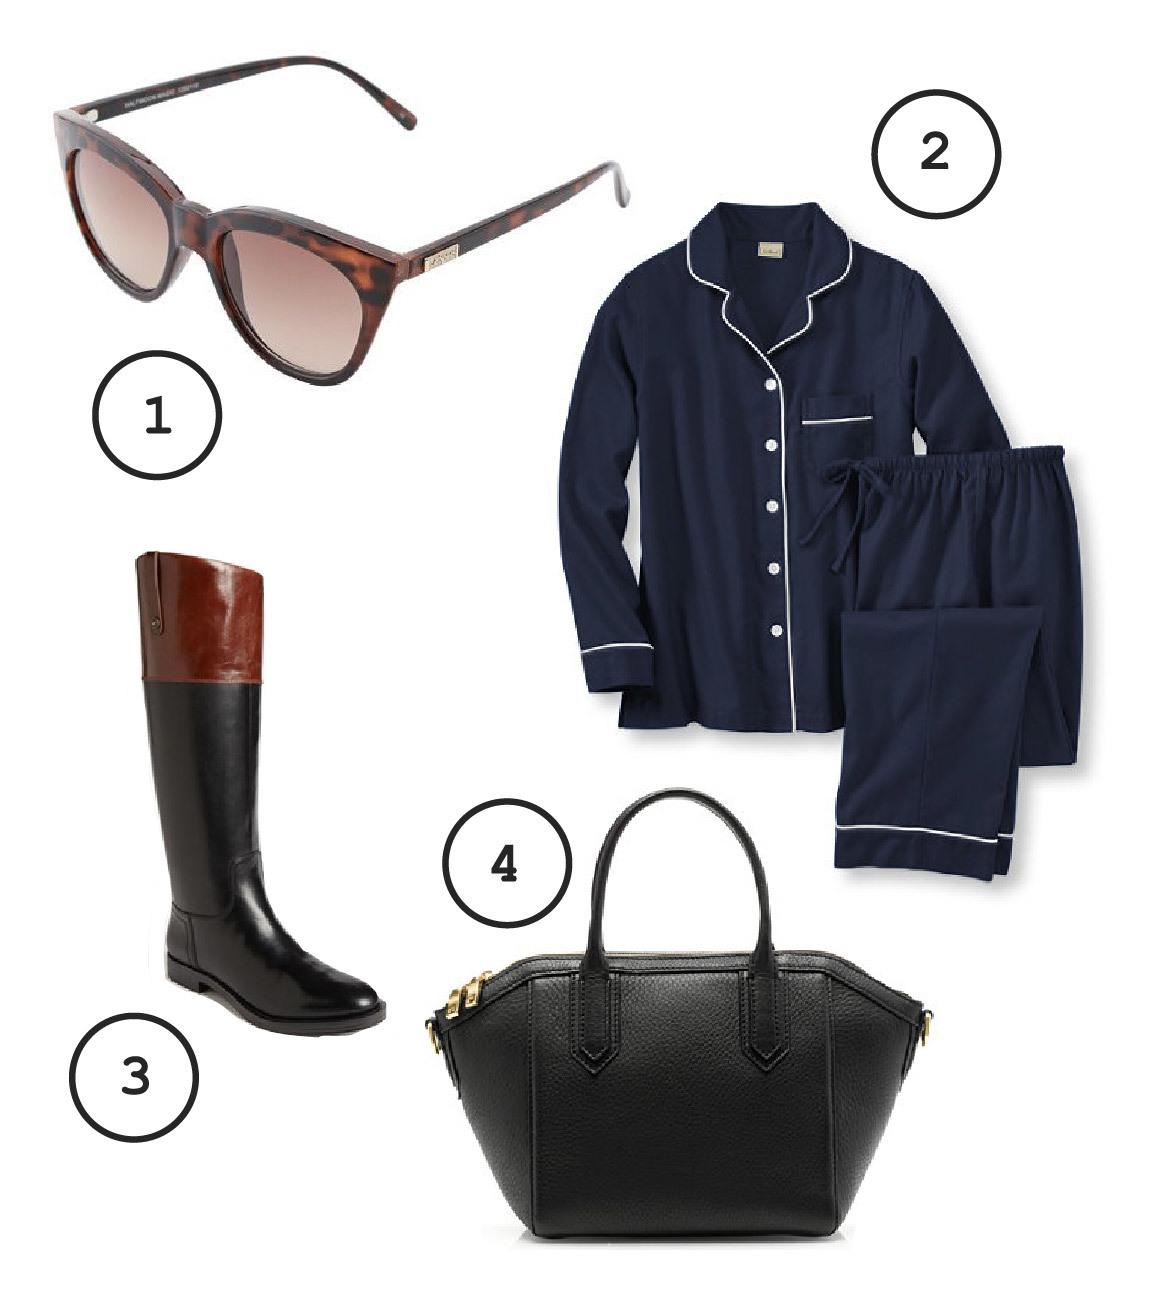 blogger christmas wish list: closet staples